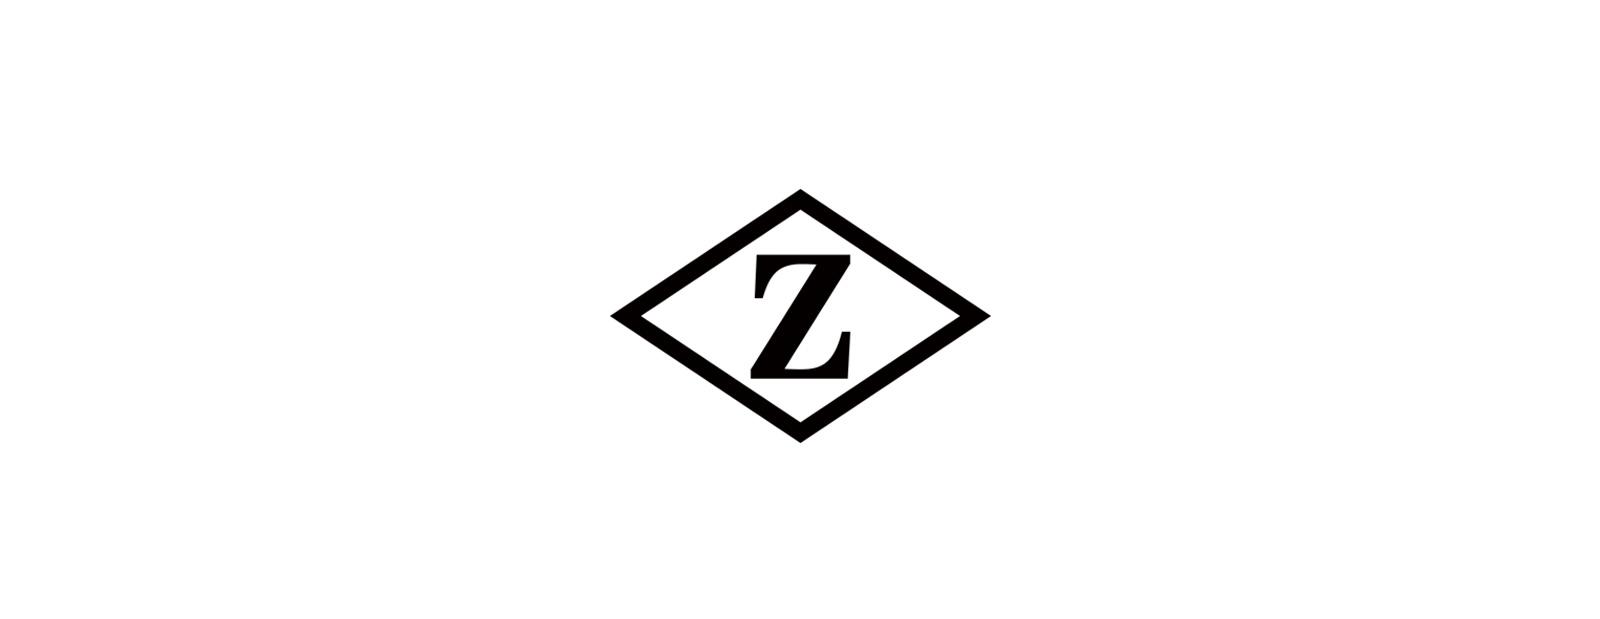 Z_ICON